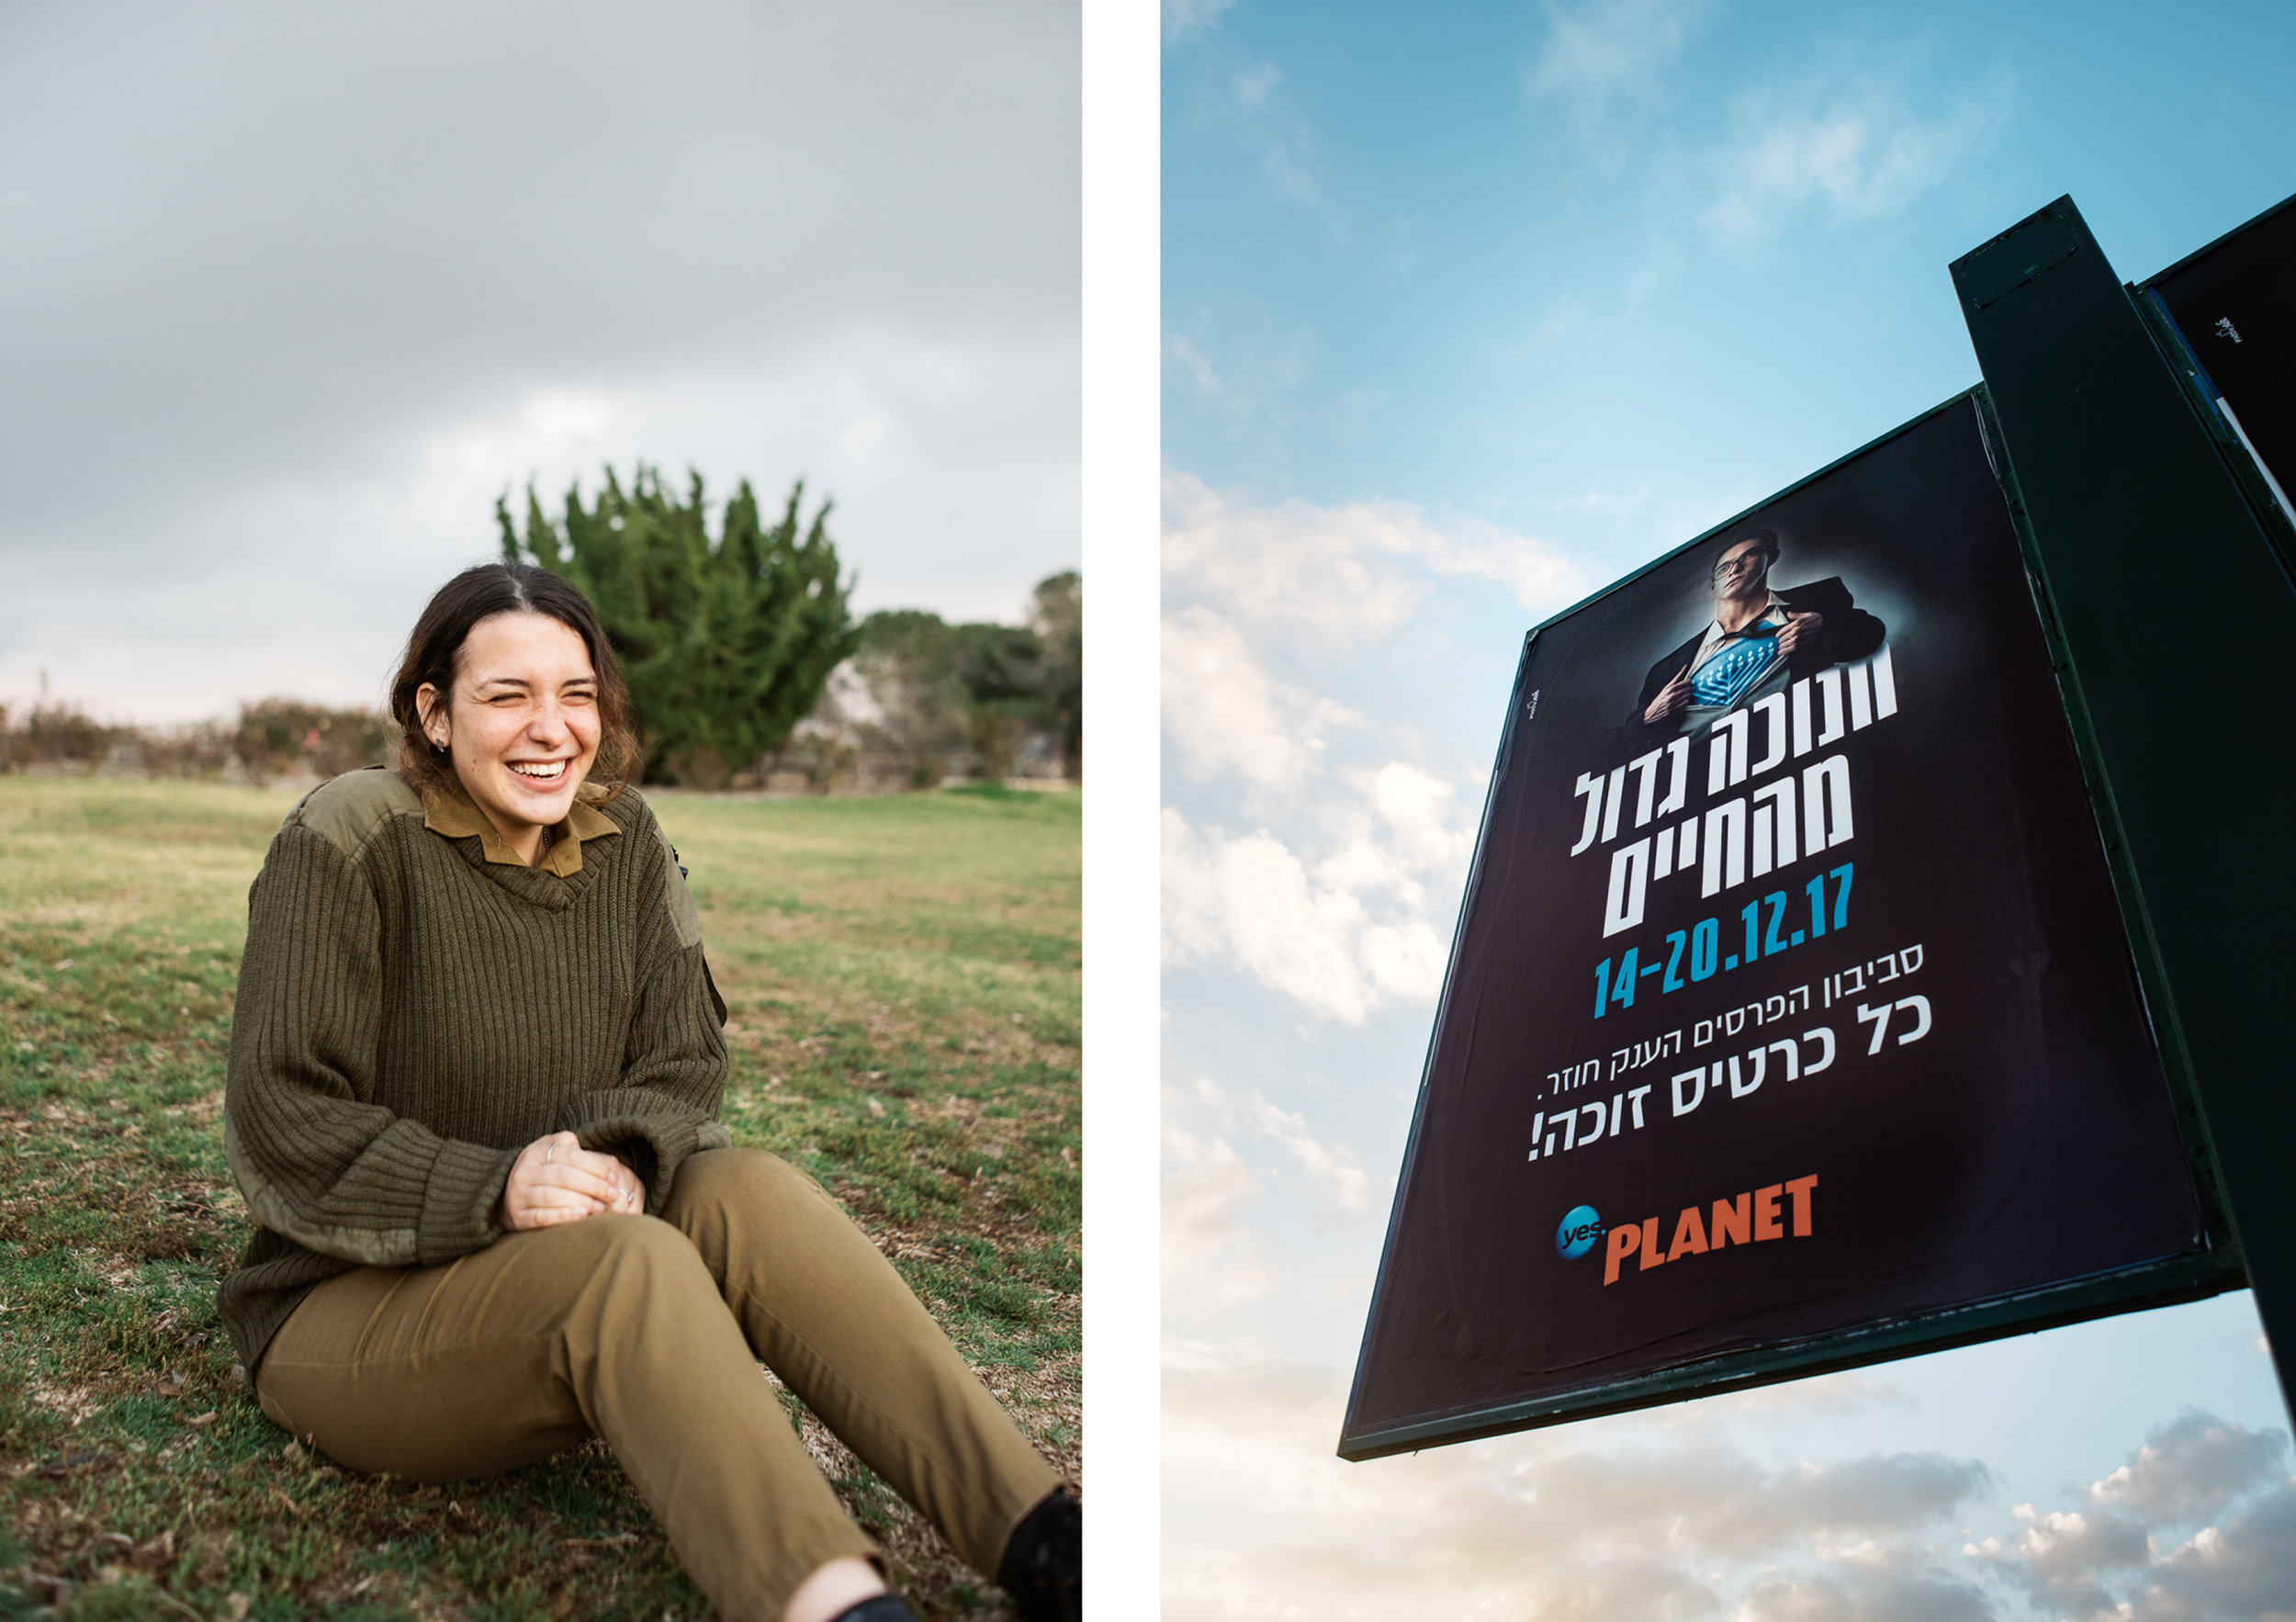 israel jack sorokin middle east photography fine art travel jewish judaism rocks TV show idf solider girl laughing joy